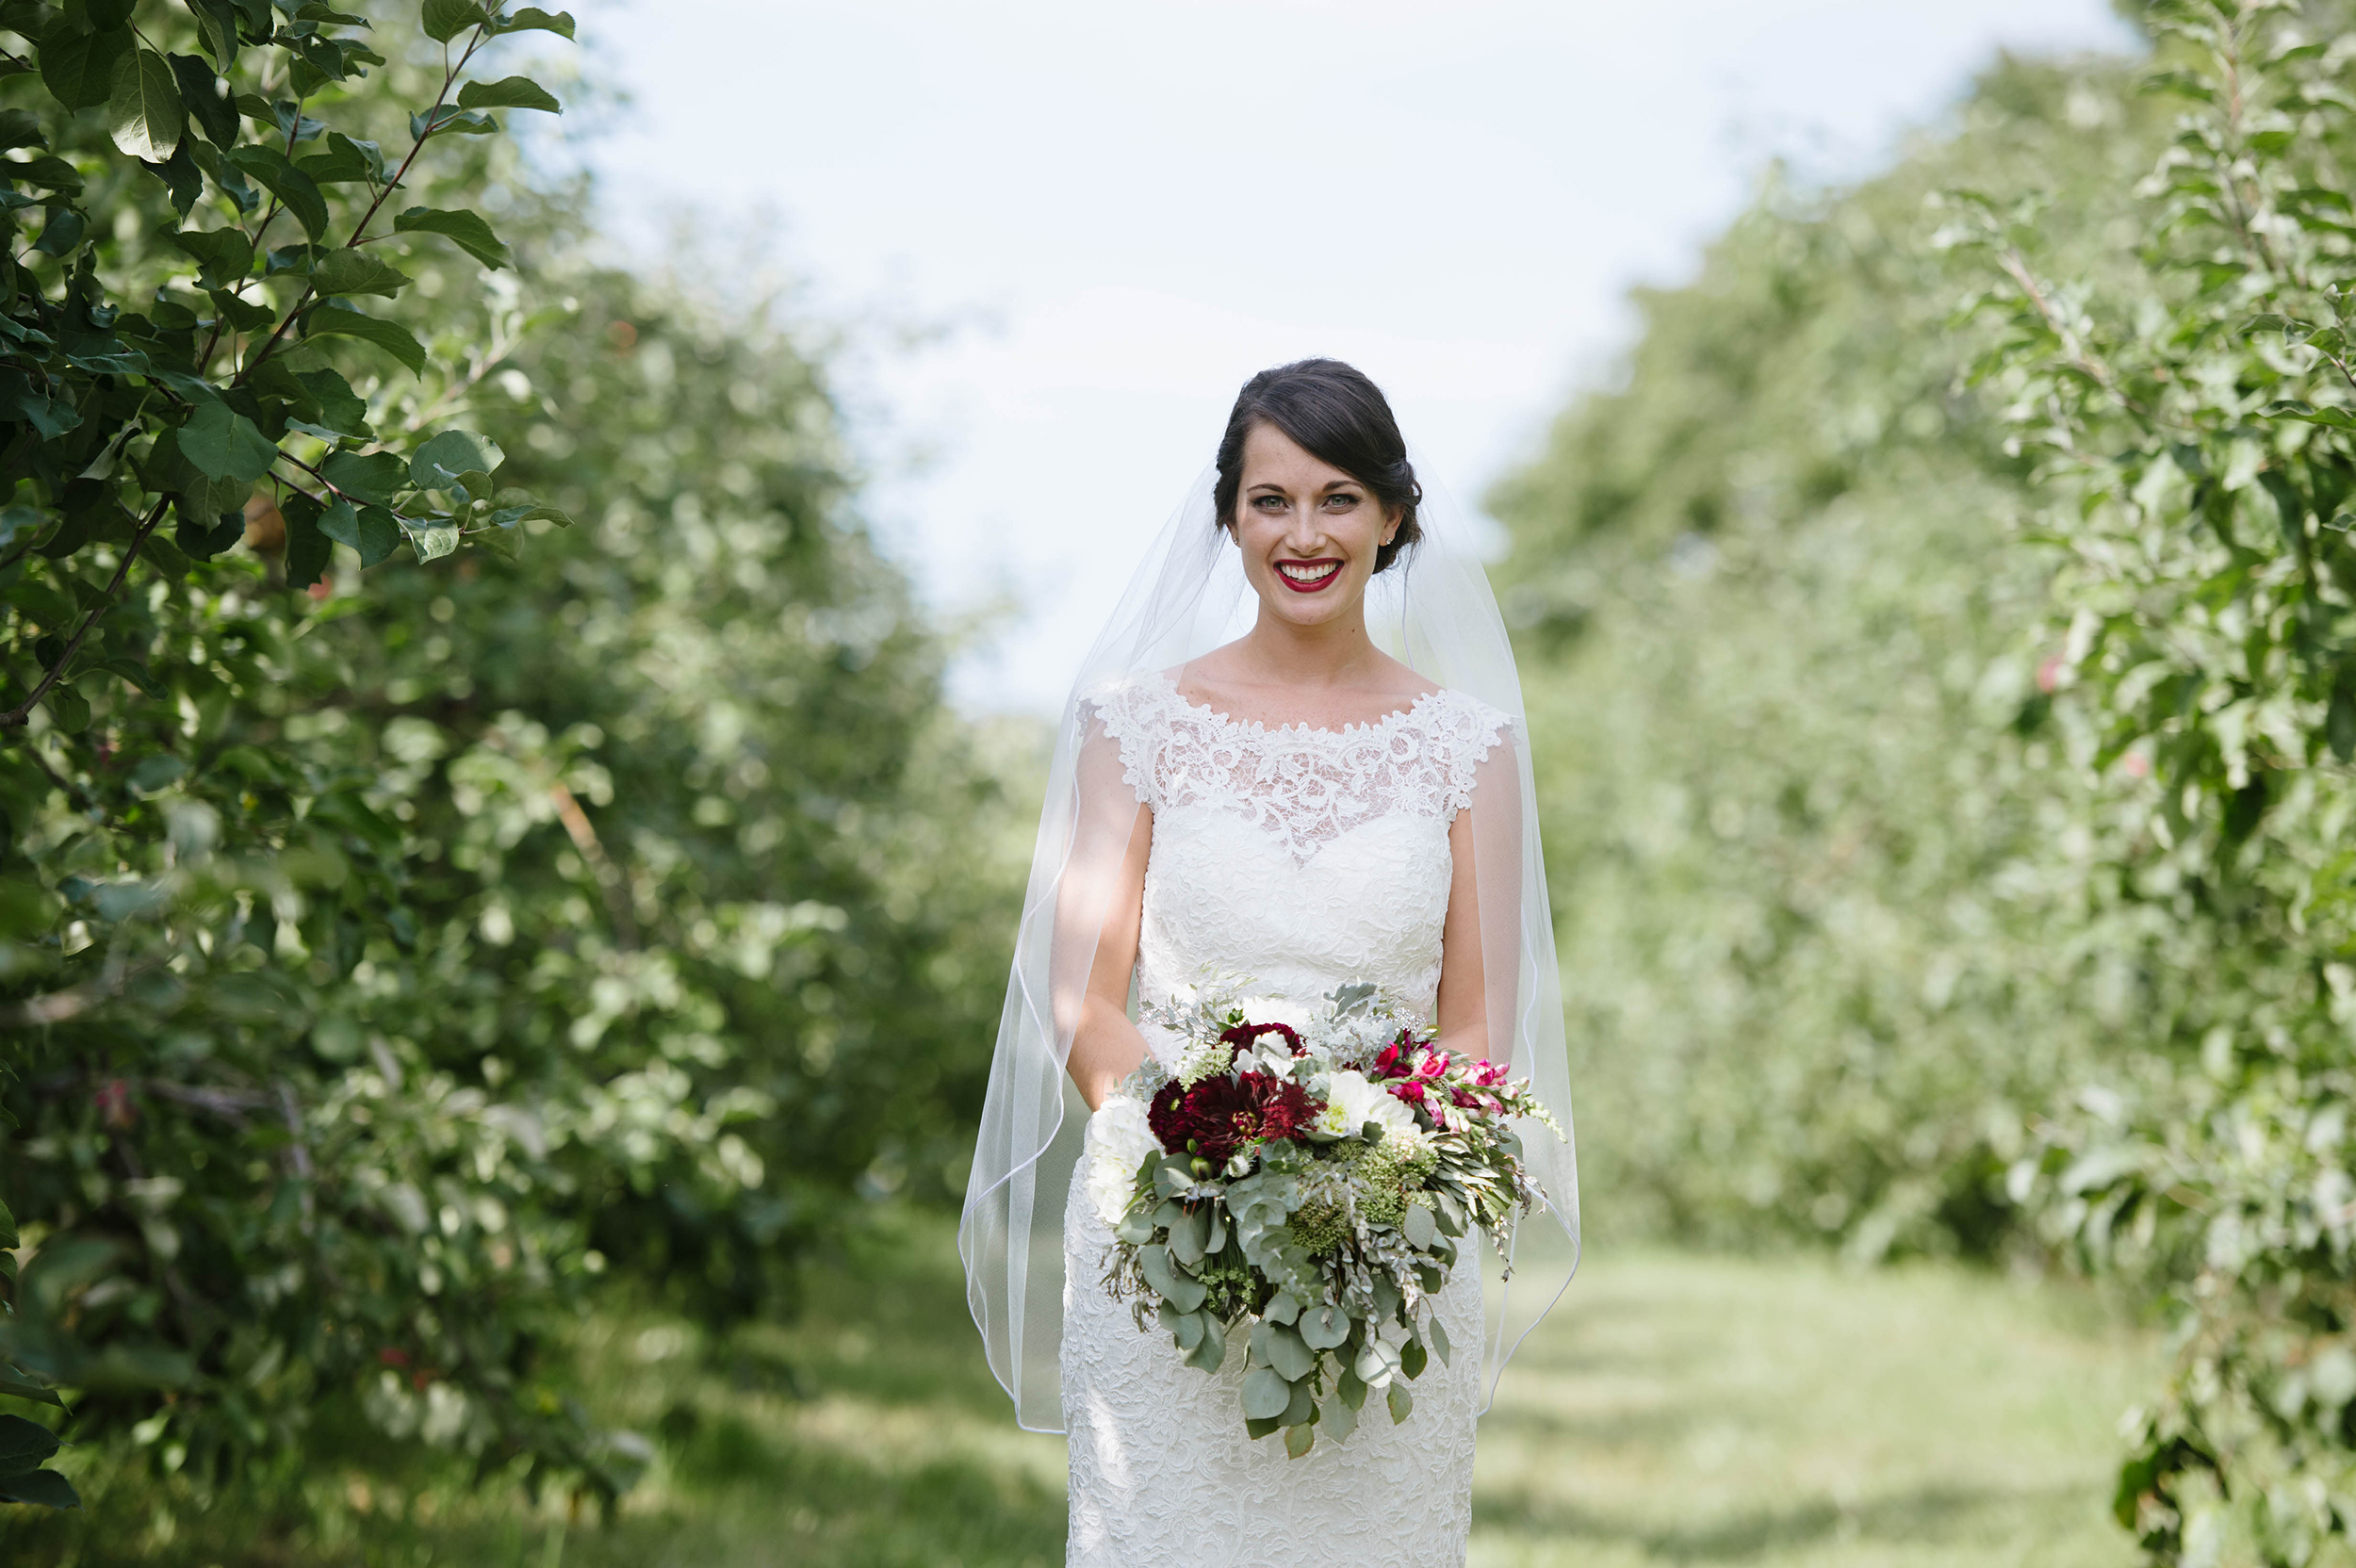 Quonquont-Farm-Wedding038.jpg